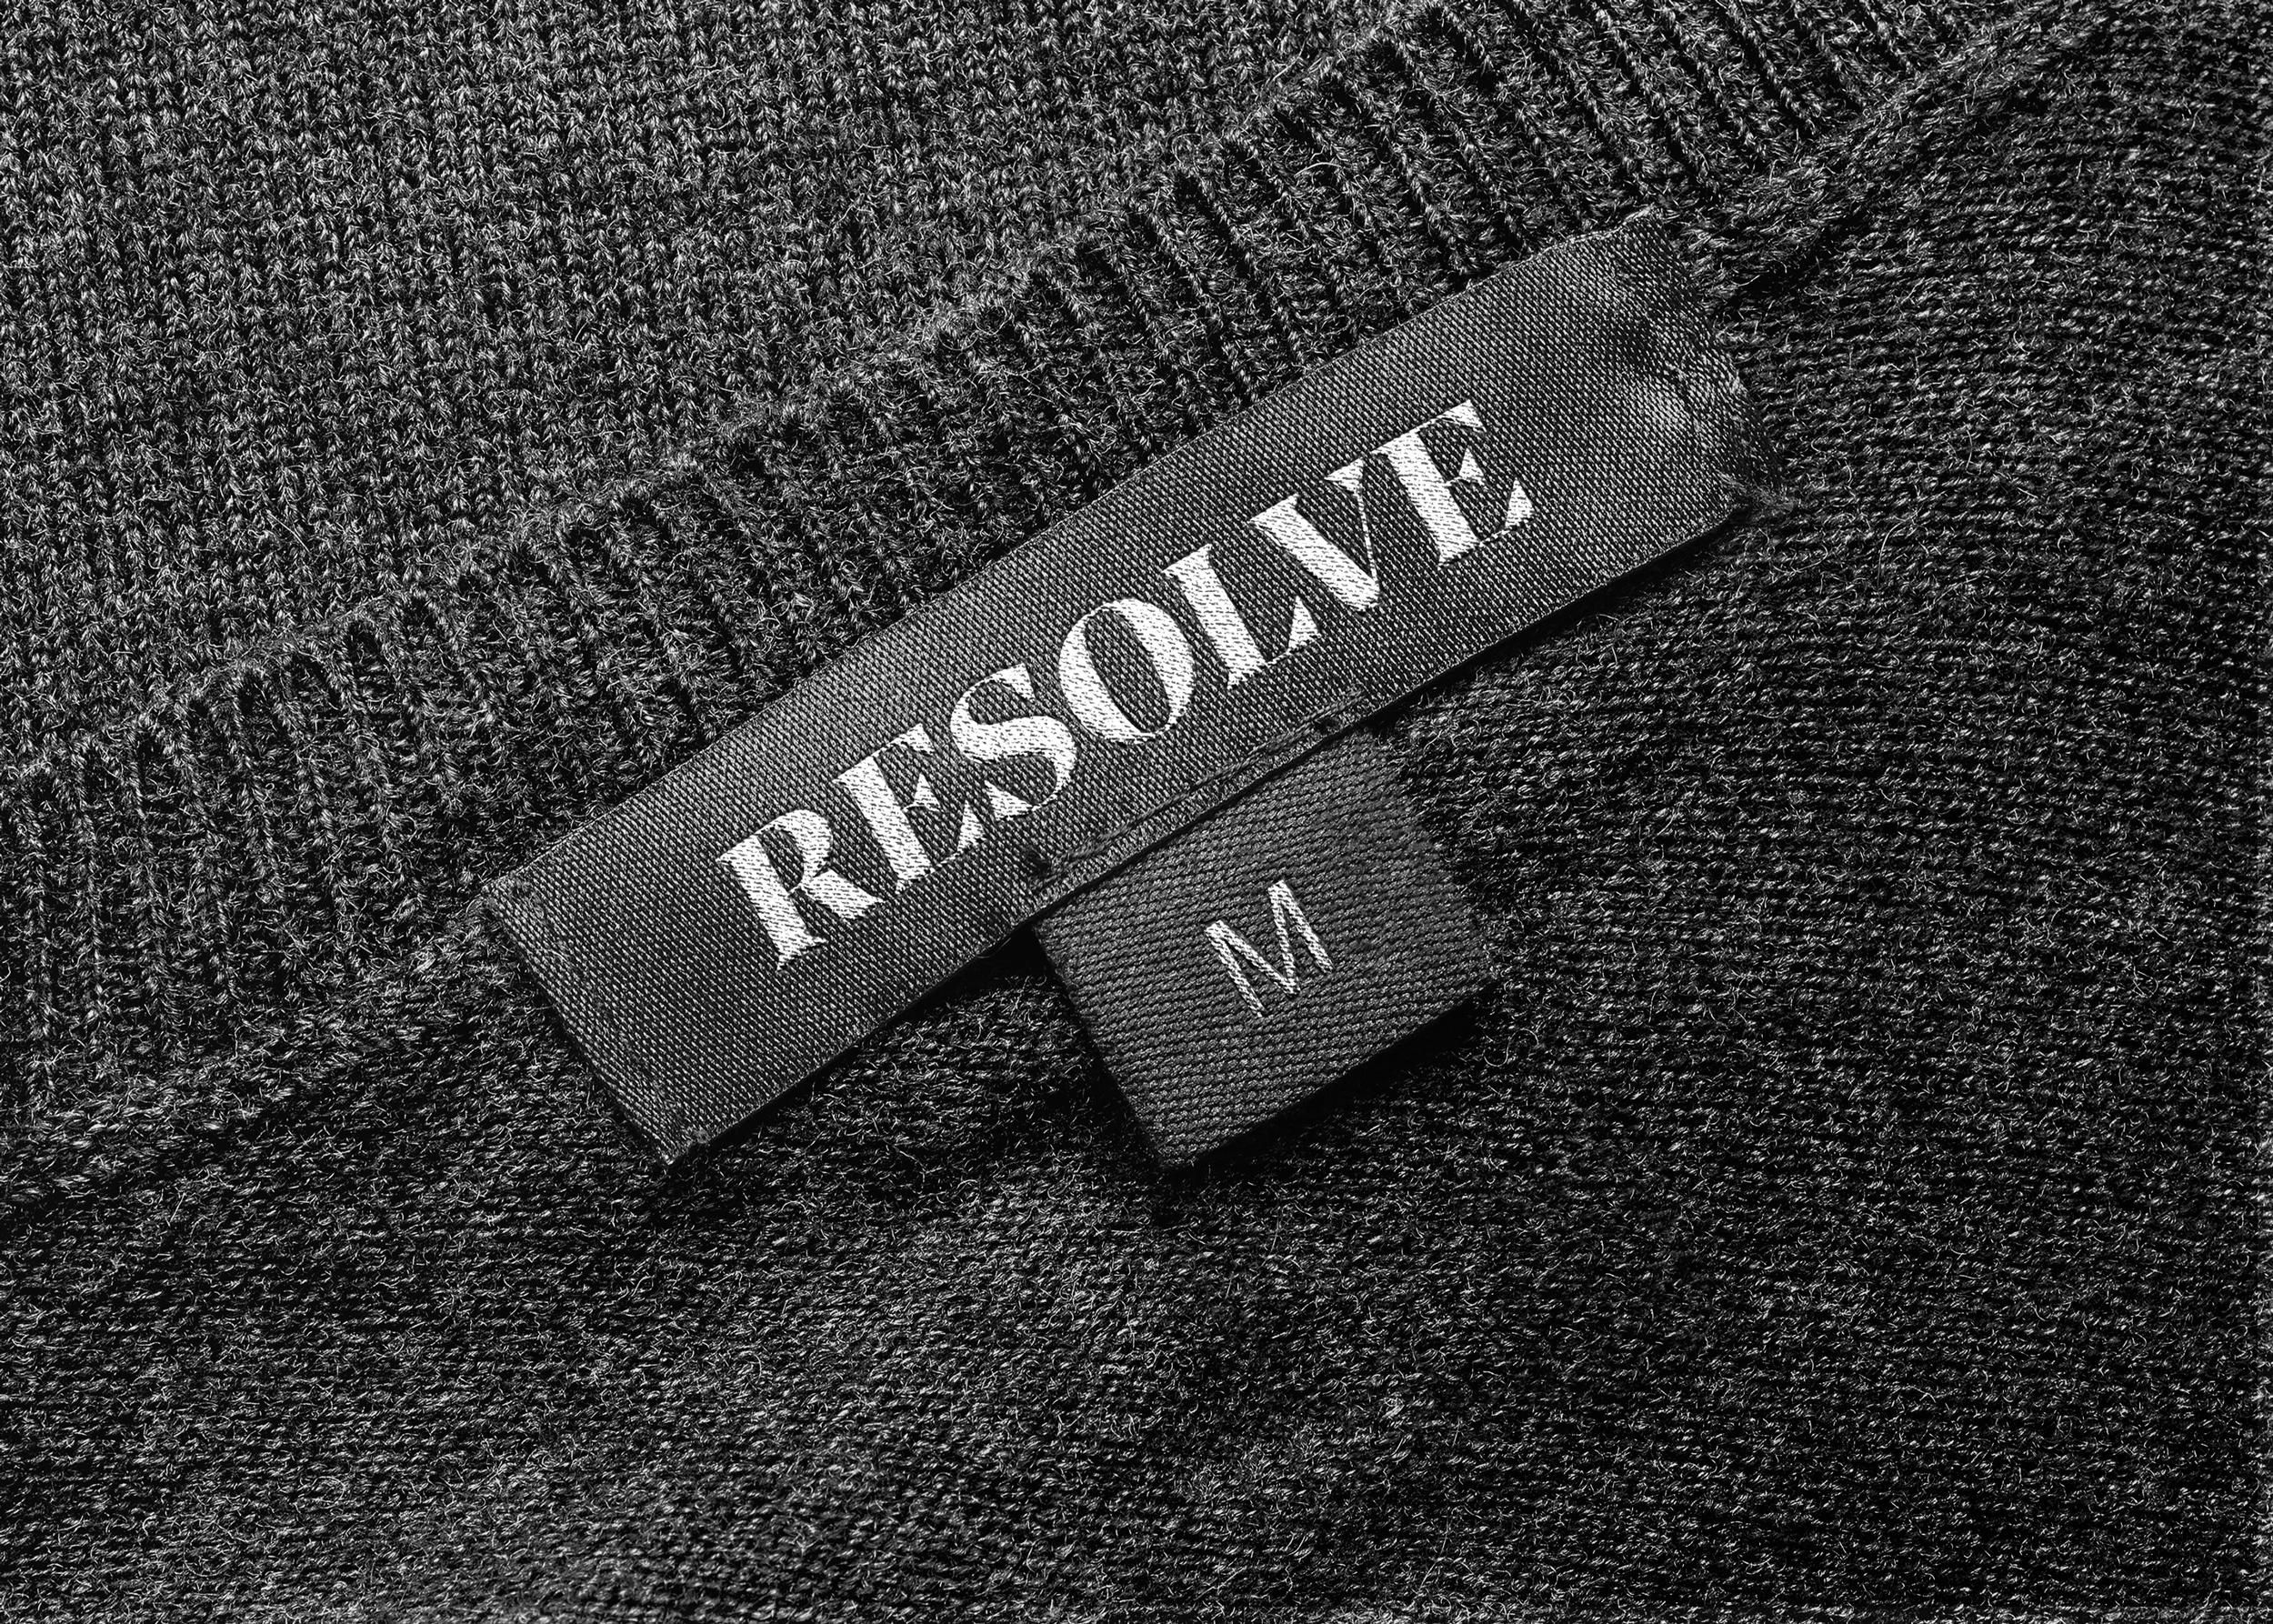 Resolve Clothing logo stitched into clothing label